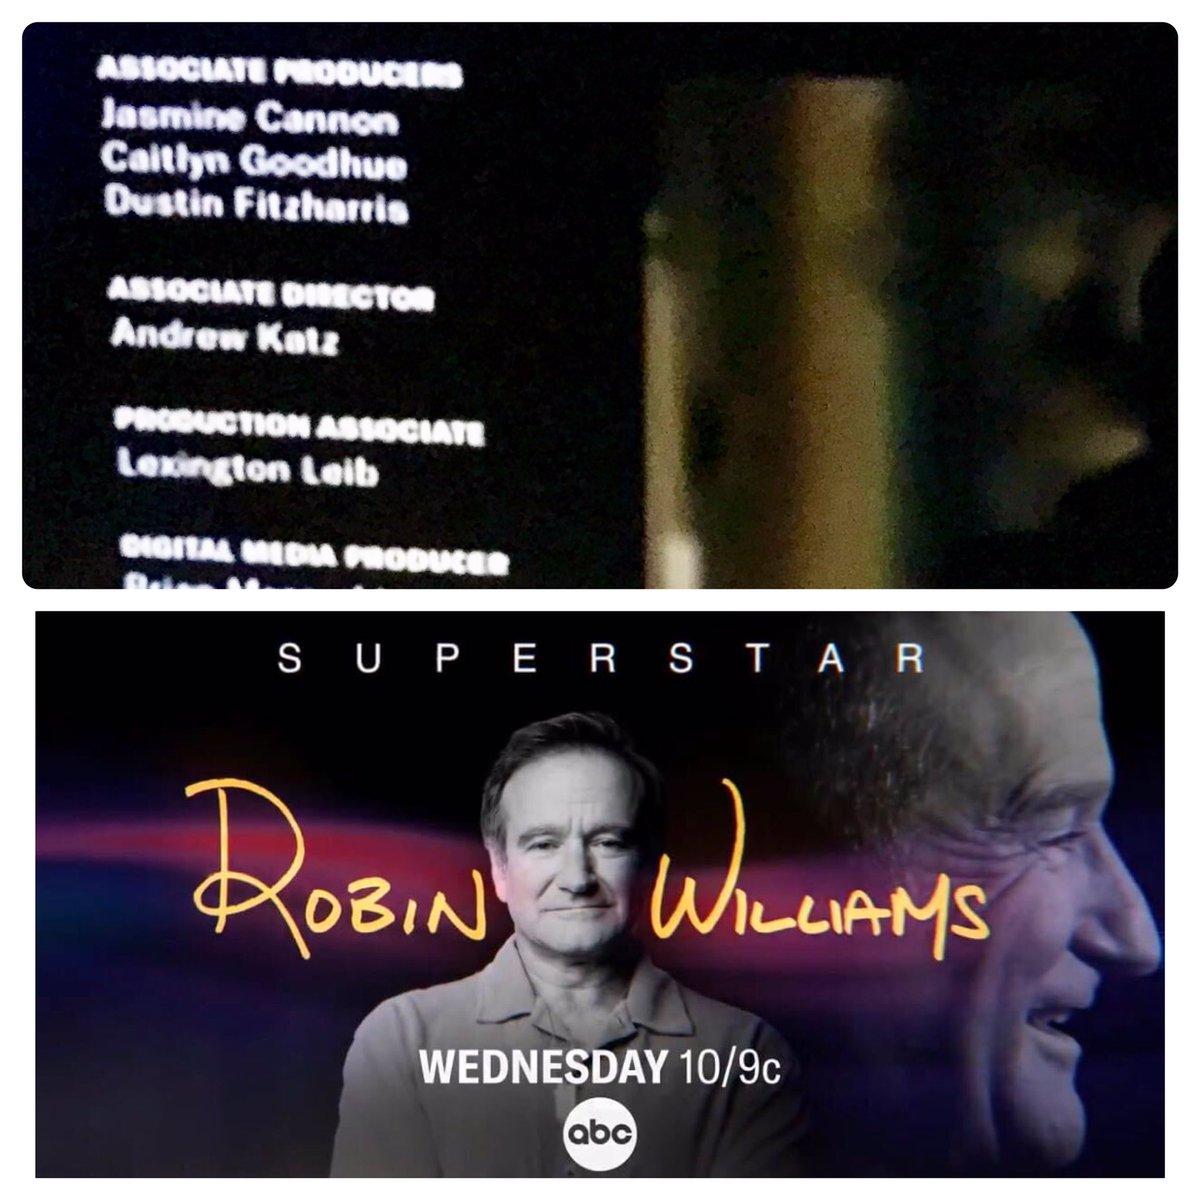 RobinWilliams   Twitter Search